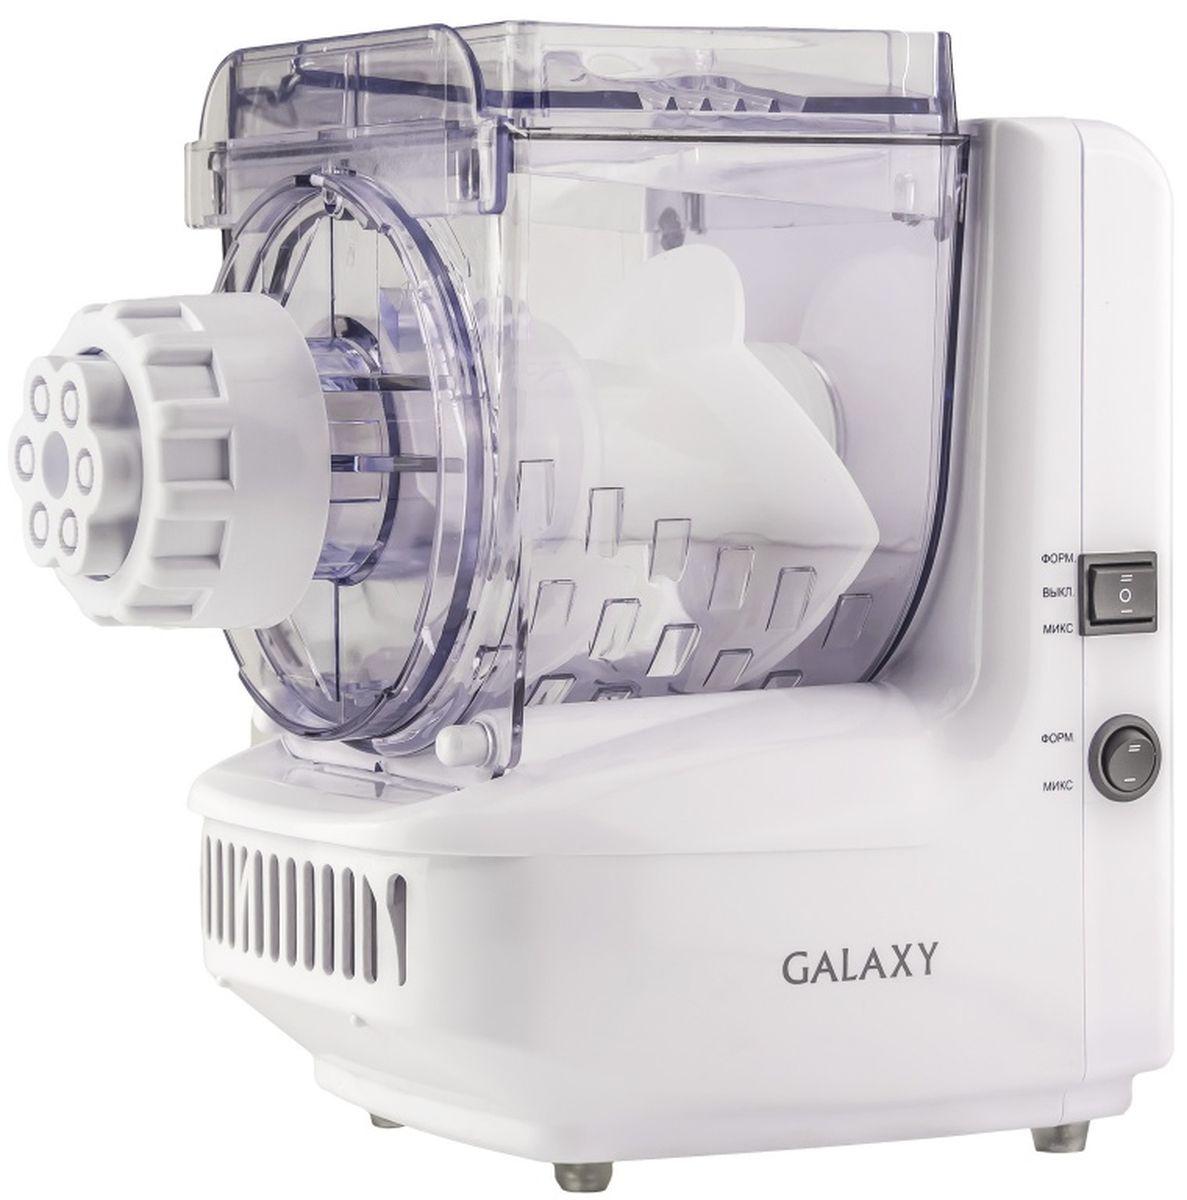 Паста-машина Galaxy GL 2550, White galaxy gl 2441 ножеточка электрическая